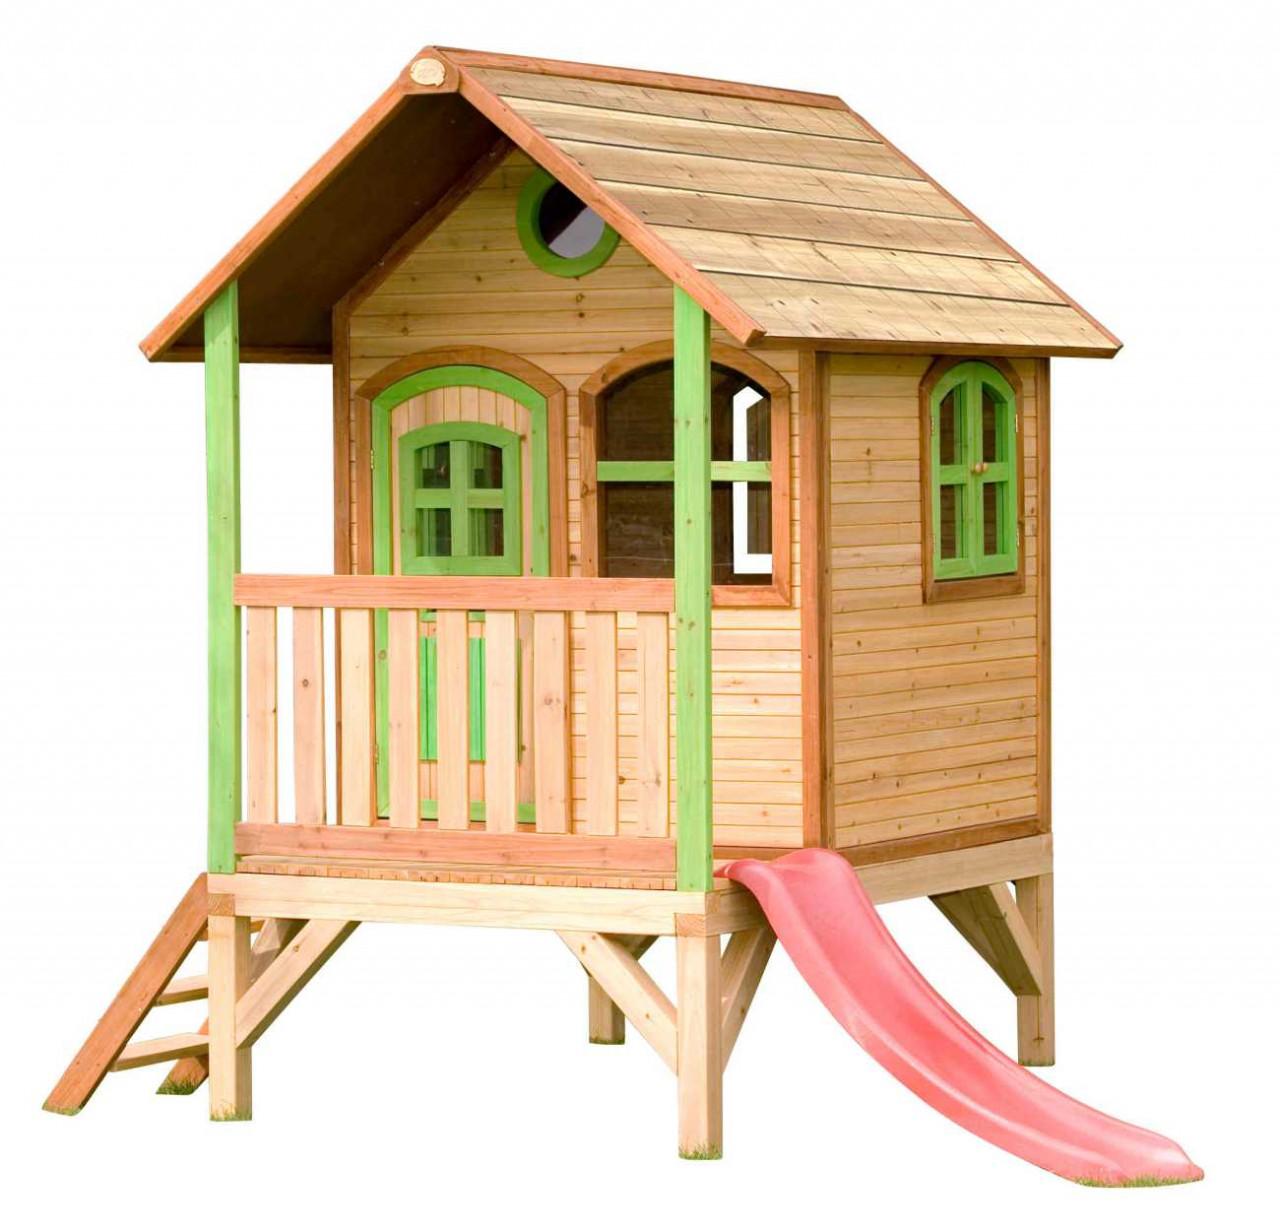 Axi Stelzenhaus Tom, Kinder Spielhaus